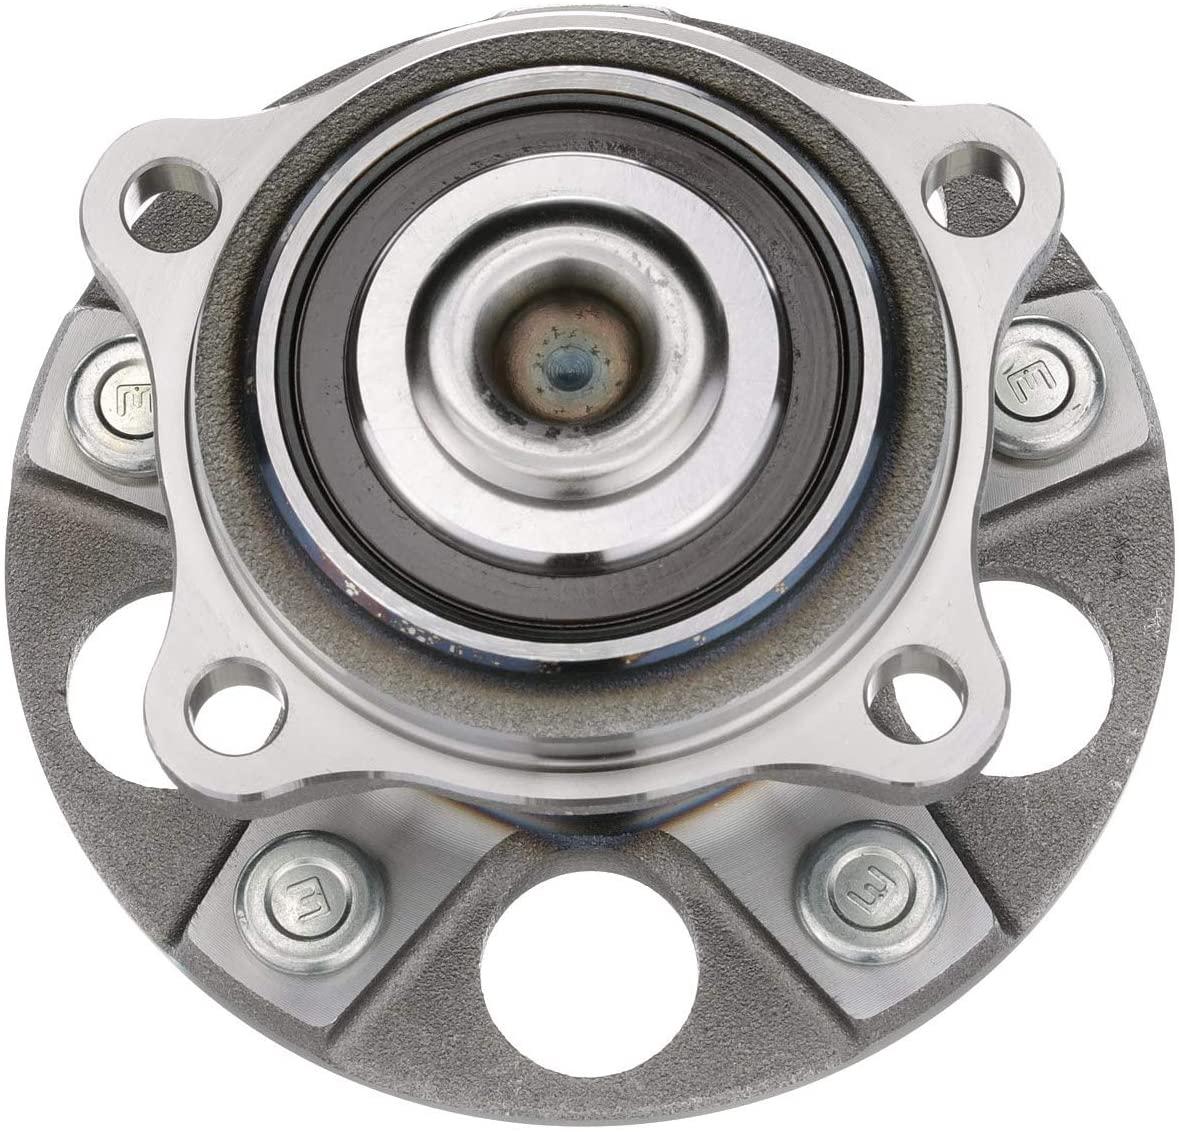 NSK 49BWKH23M Front Wheel Bearing and Hub Assembly